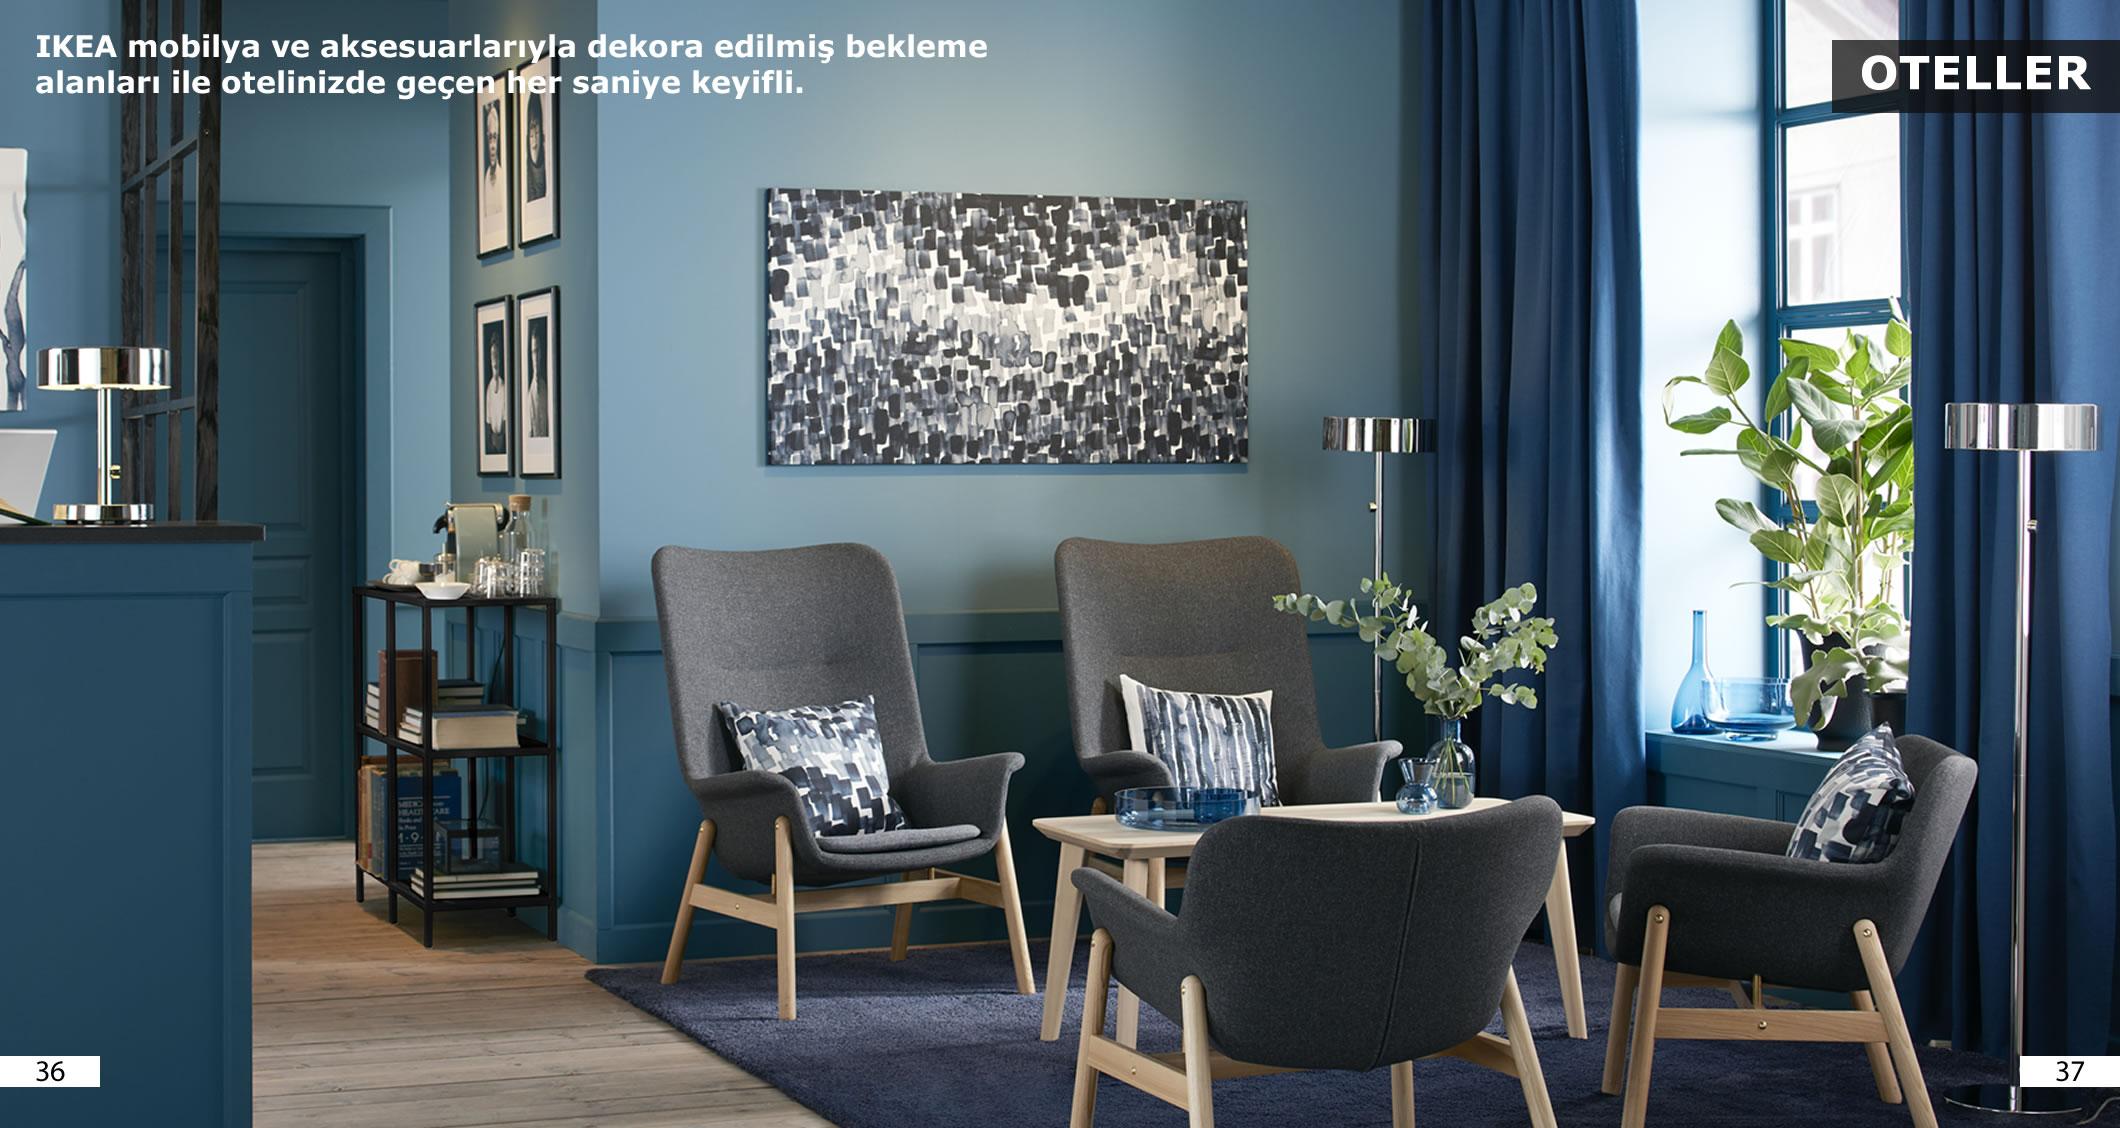 ikea t rkiye. Black Bedroom Furniture Sets. Home Design Ideas